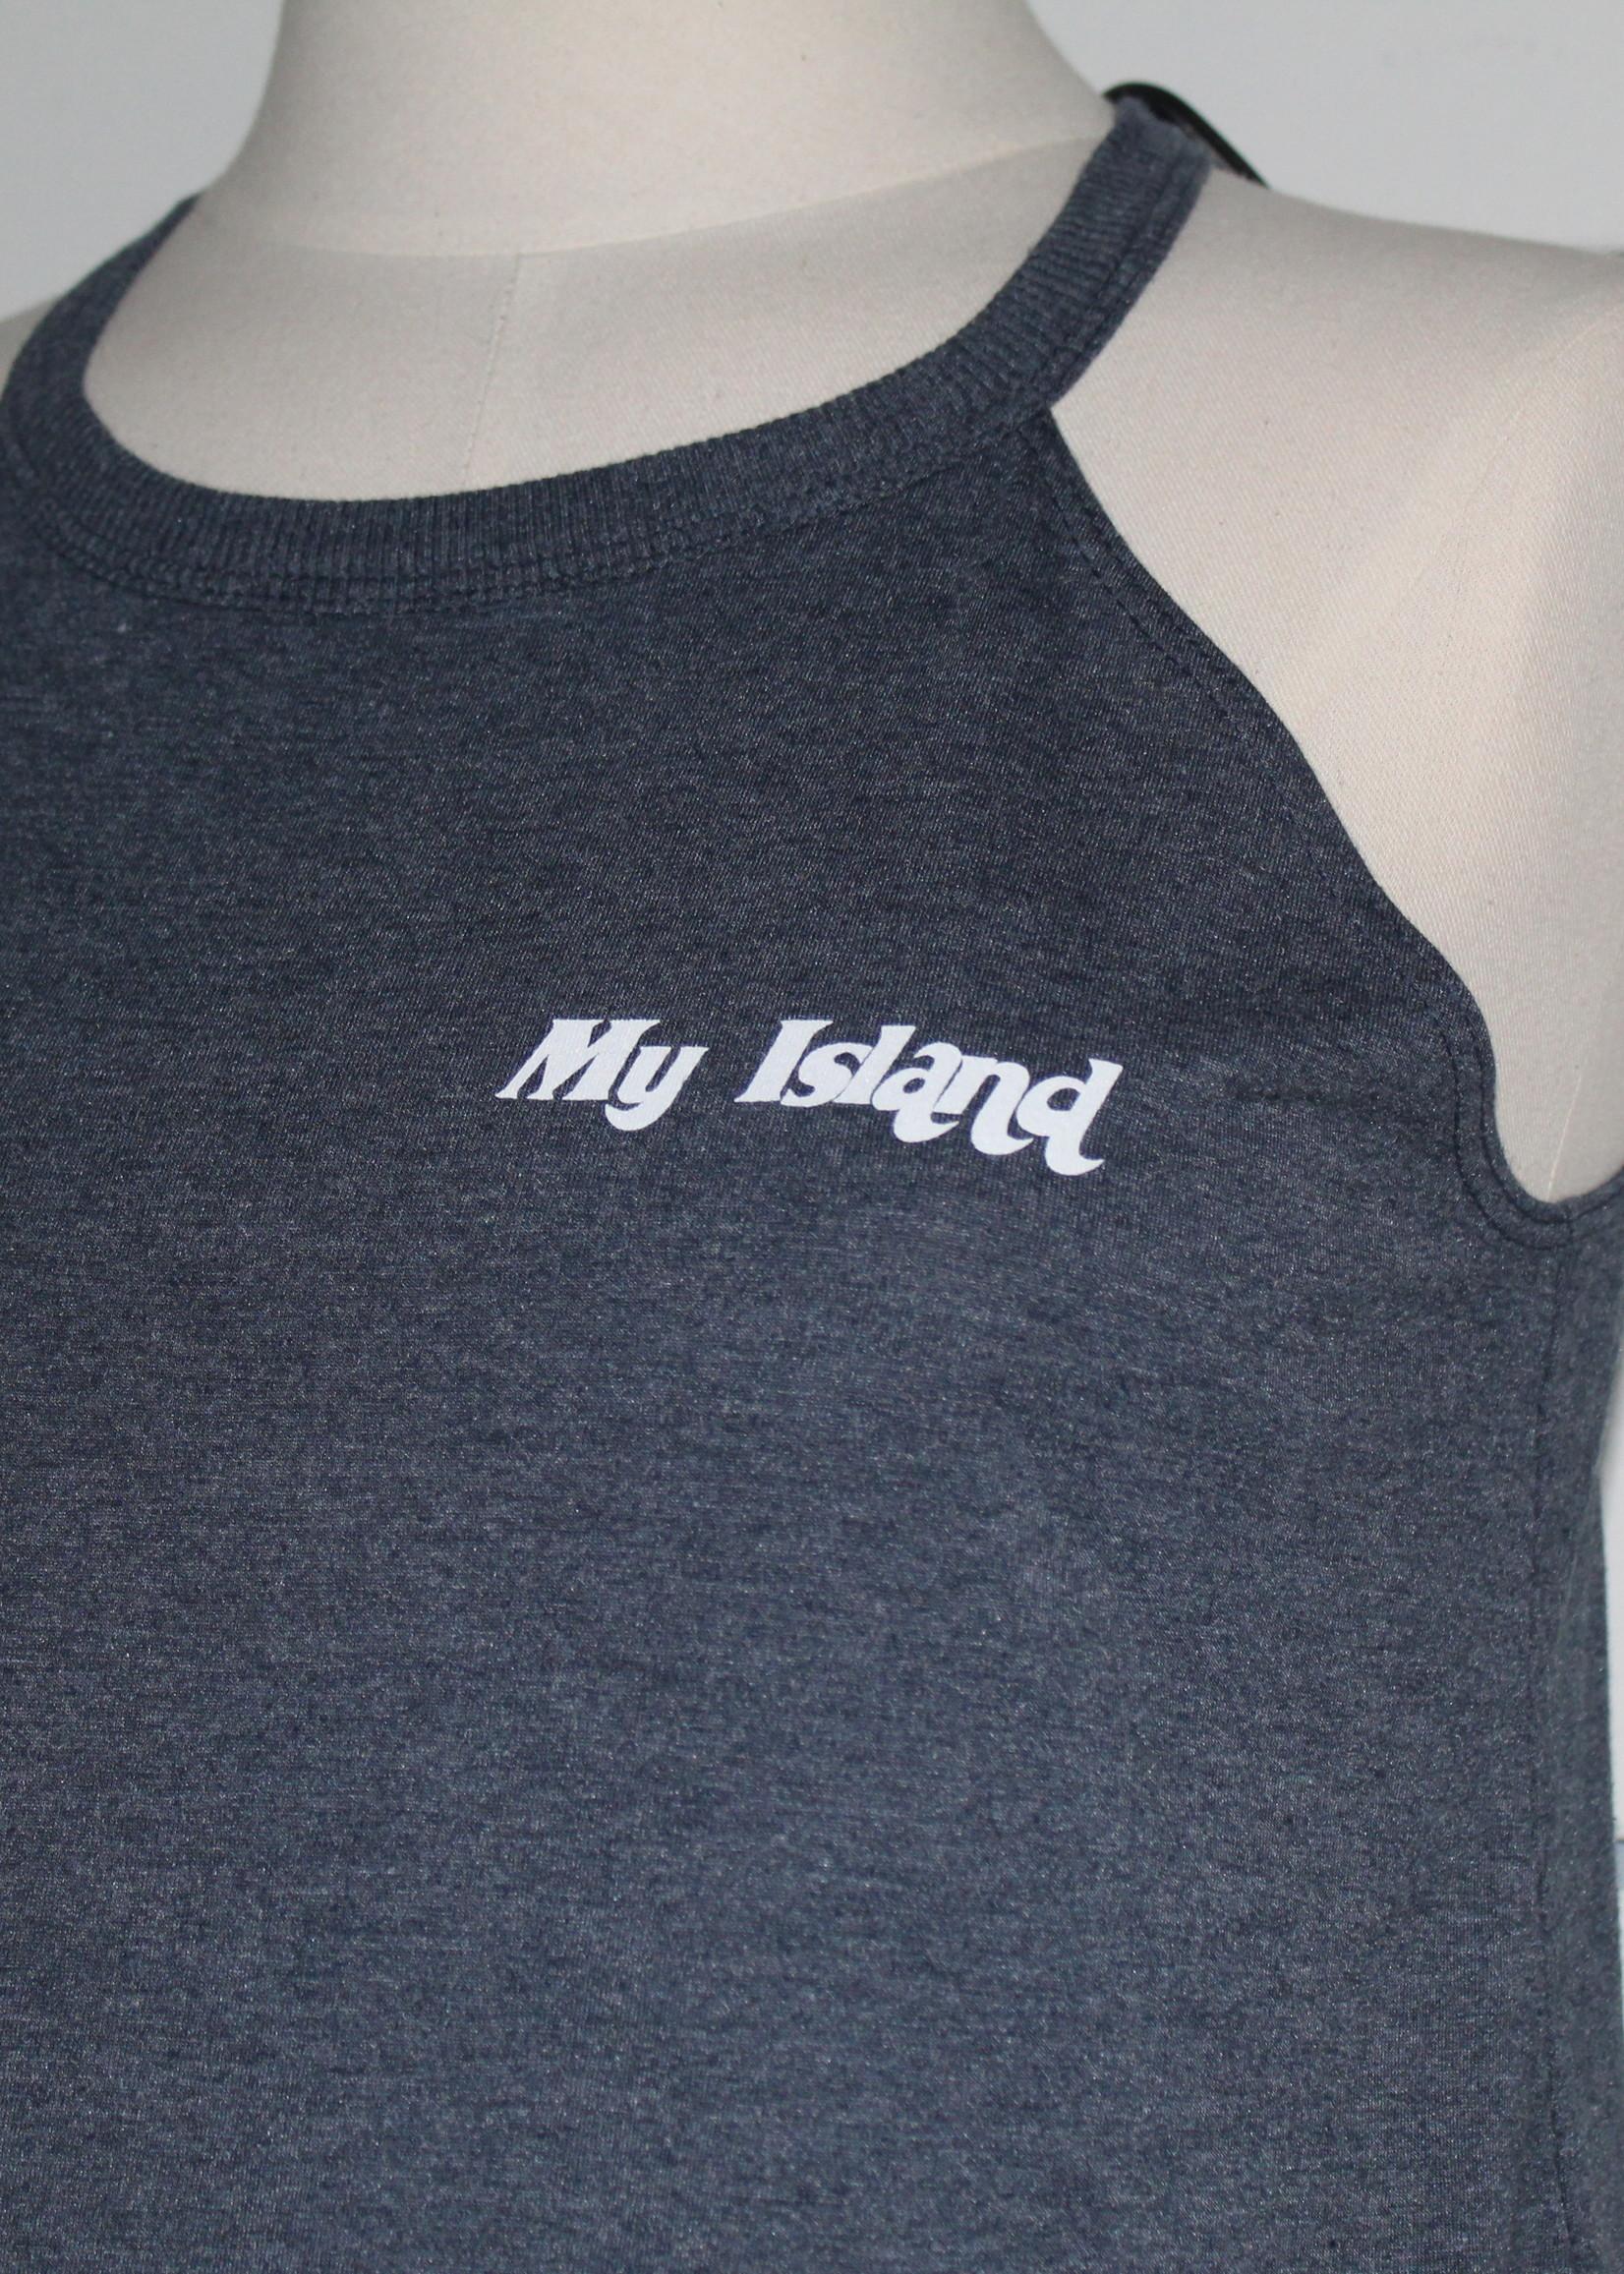 MY ISLAND My Island 60s Tank Top